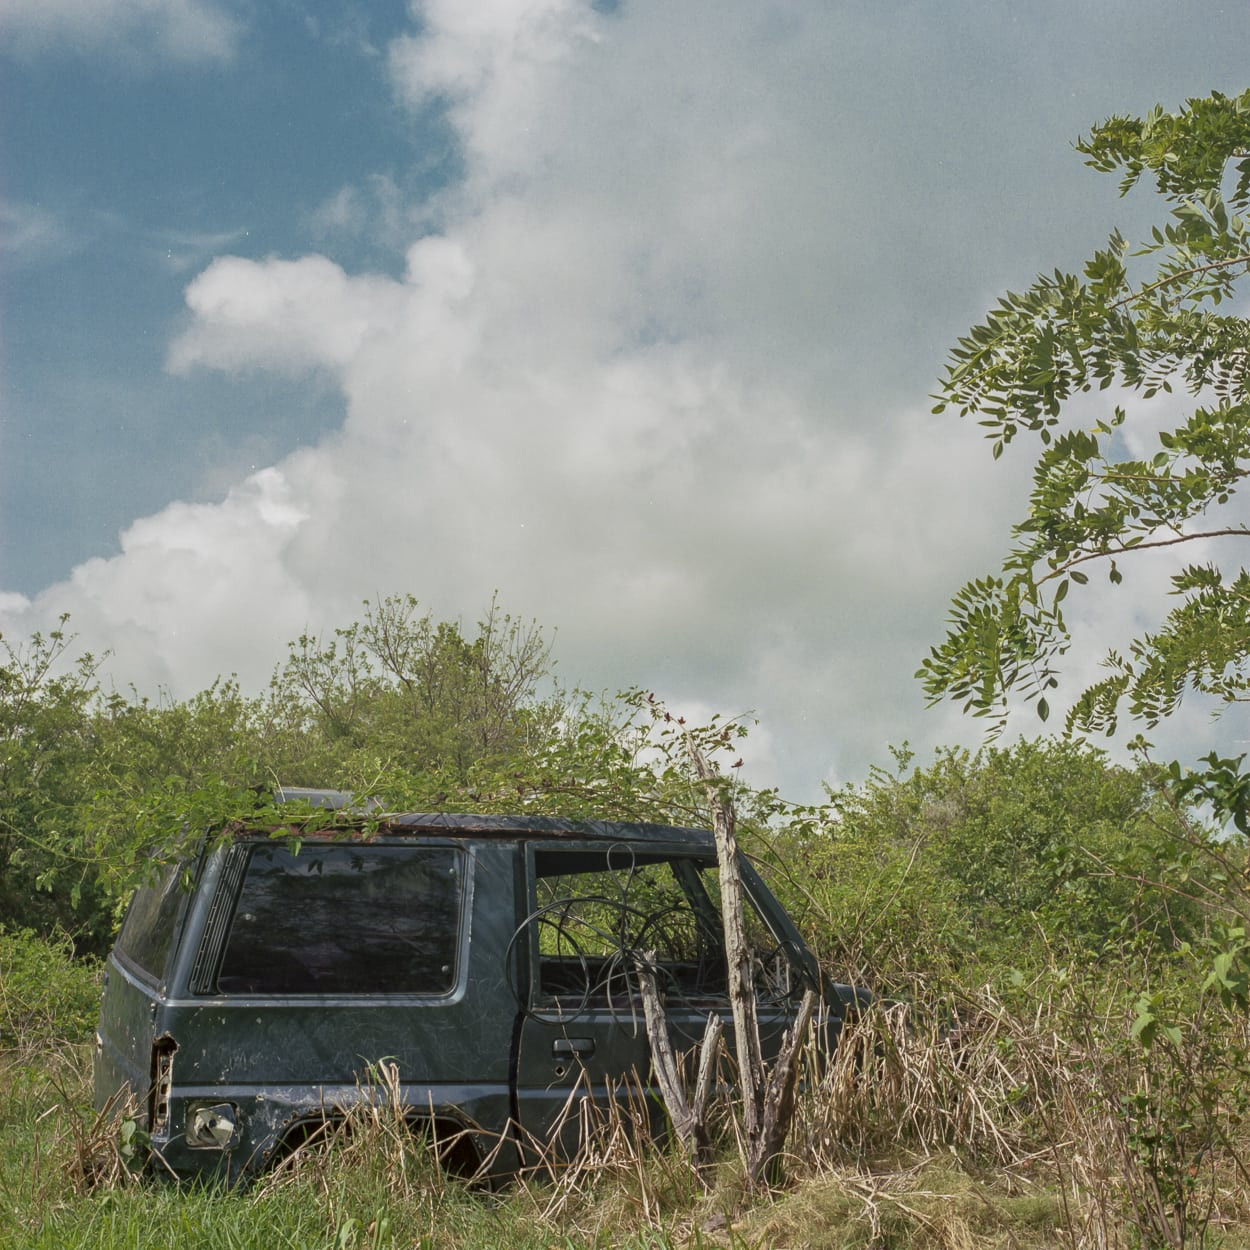 An abandoned vehicle